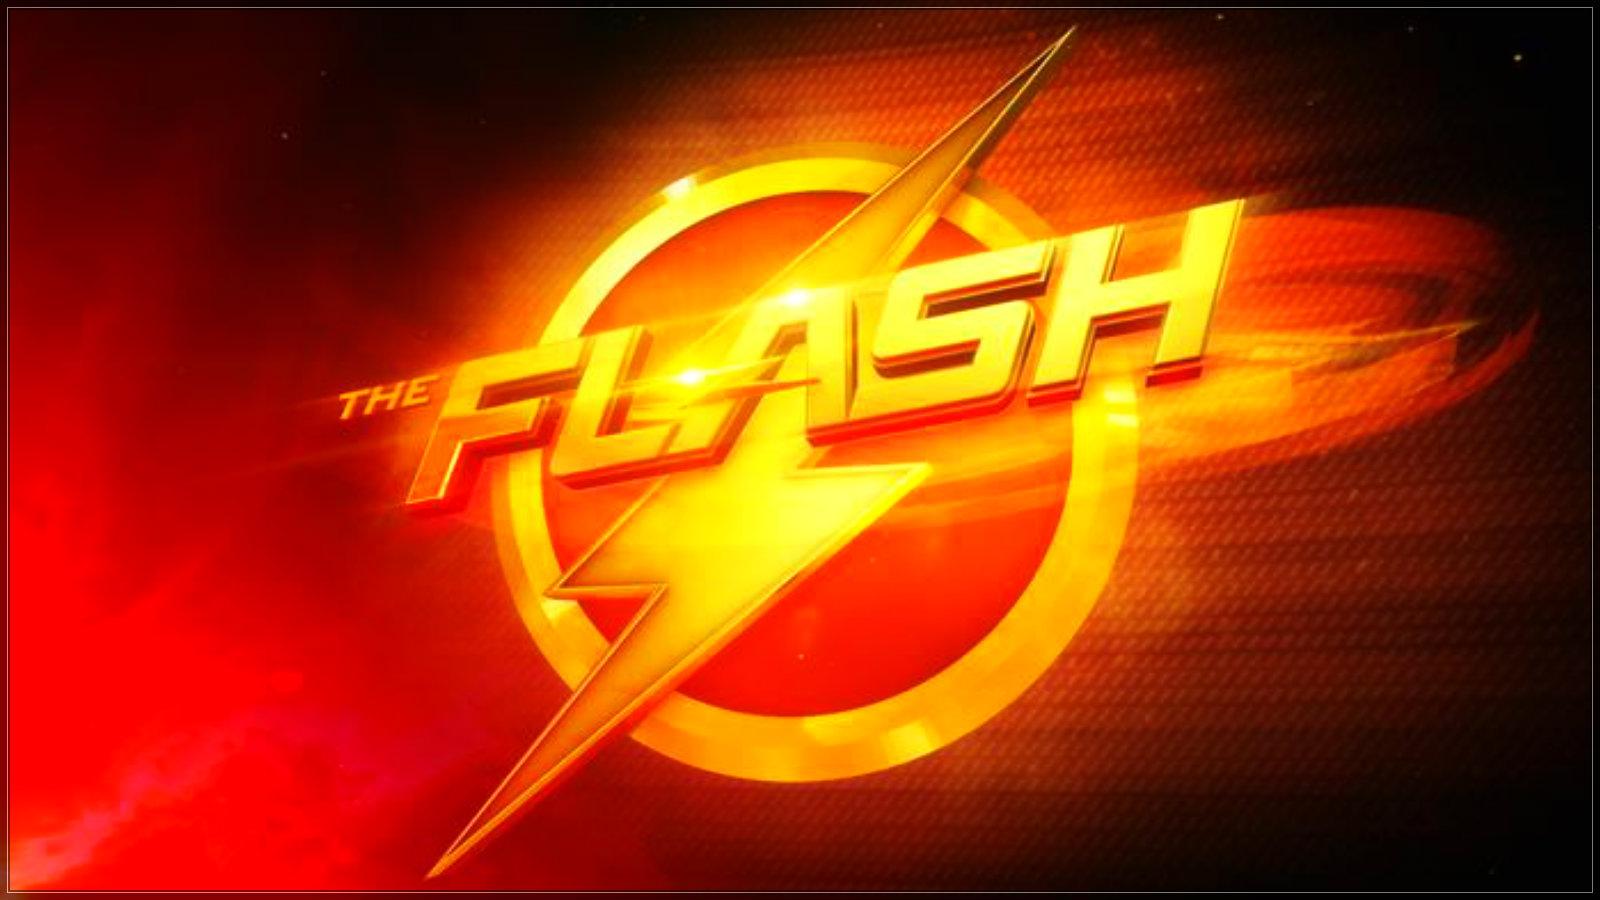 The Flash CW By Fanpopcom 1600x900